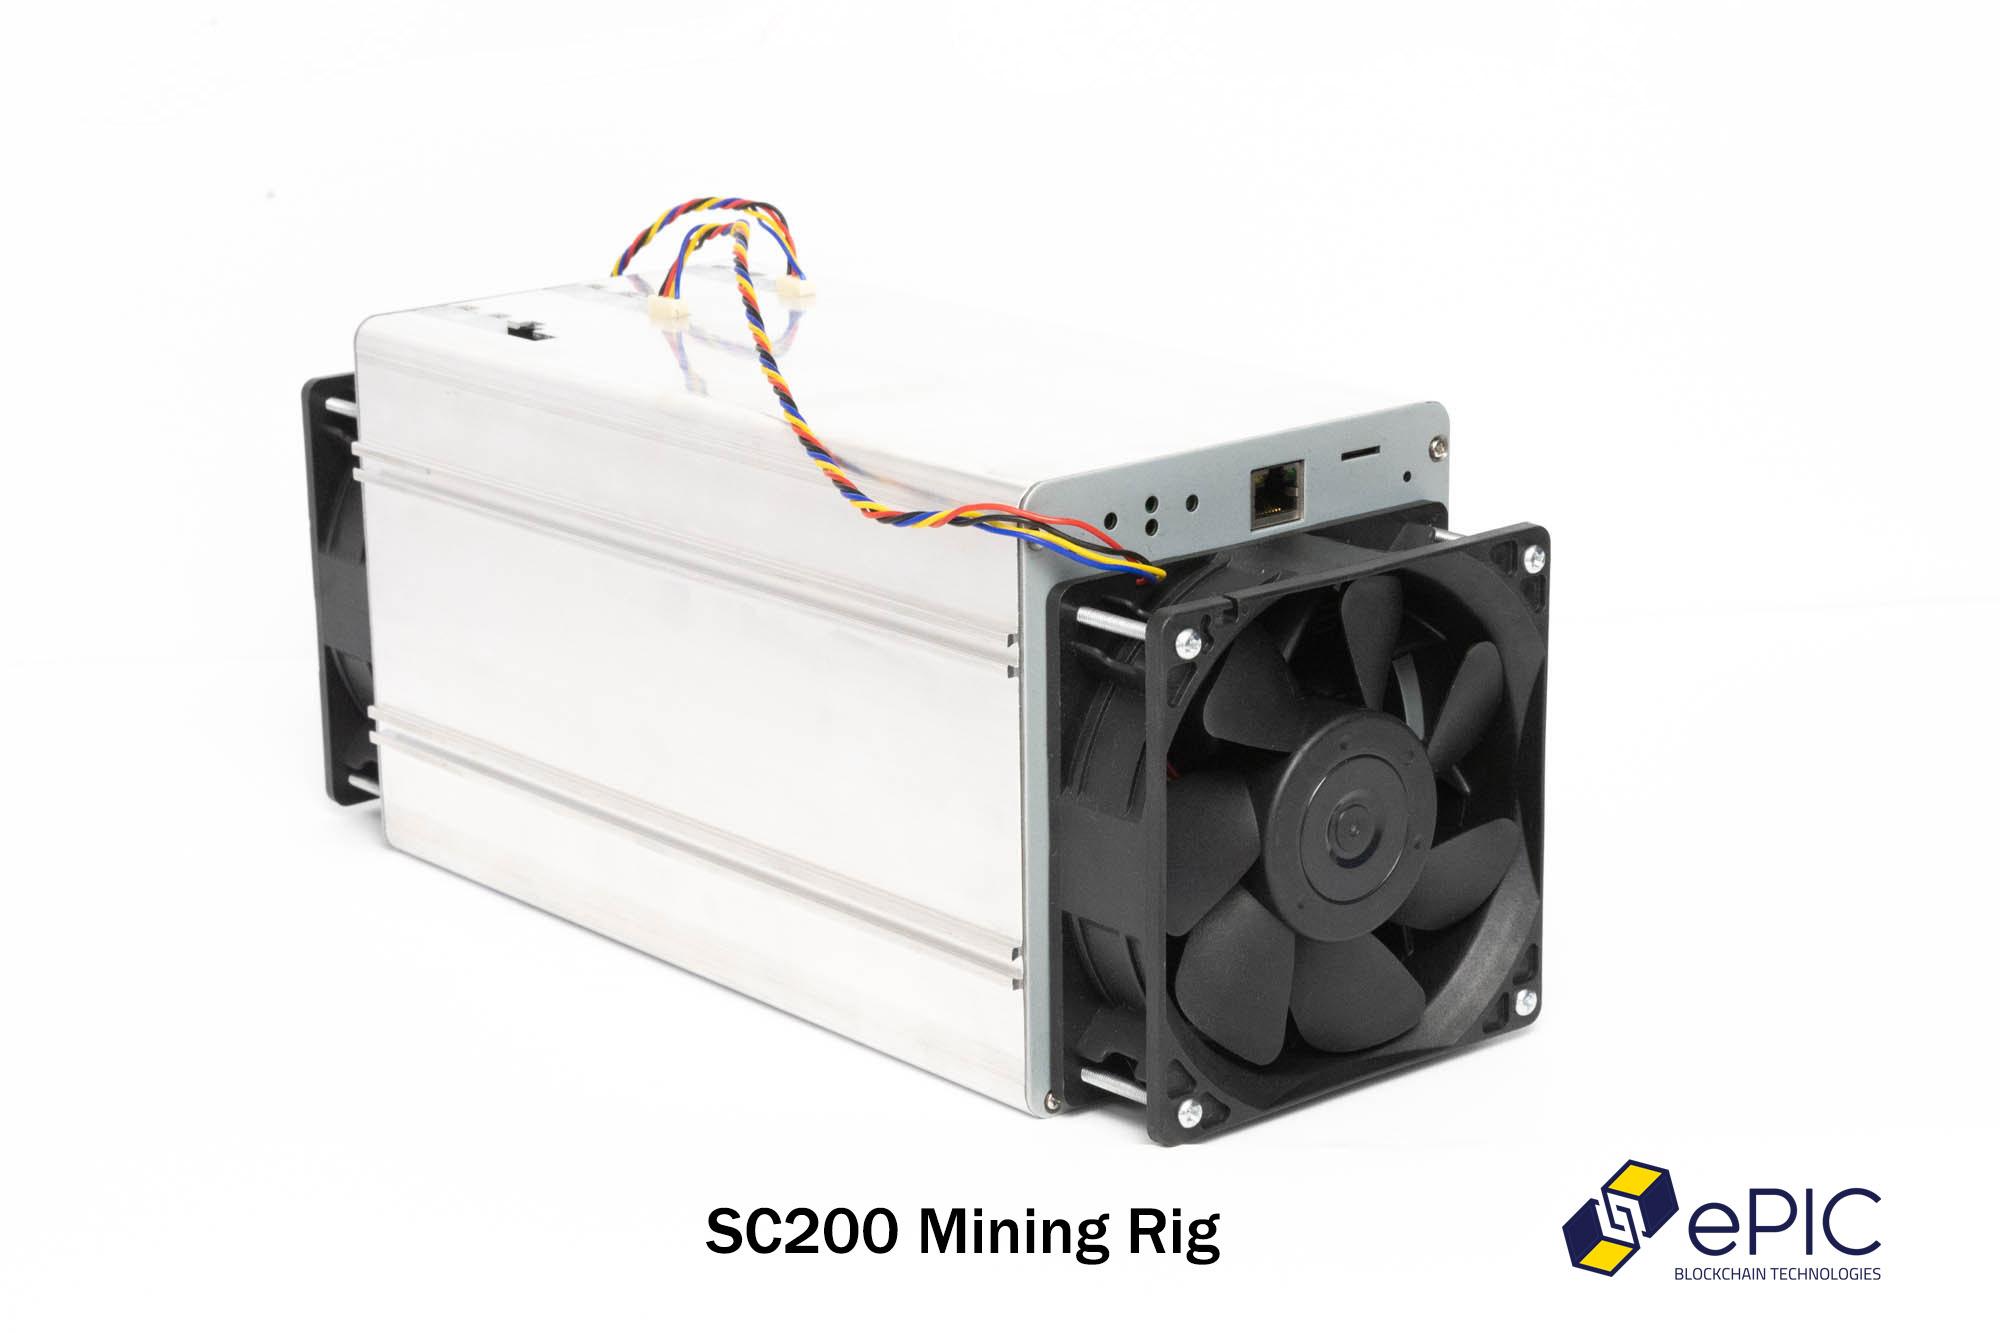 siacoin mining rig